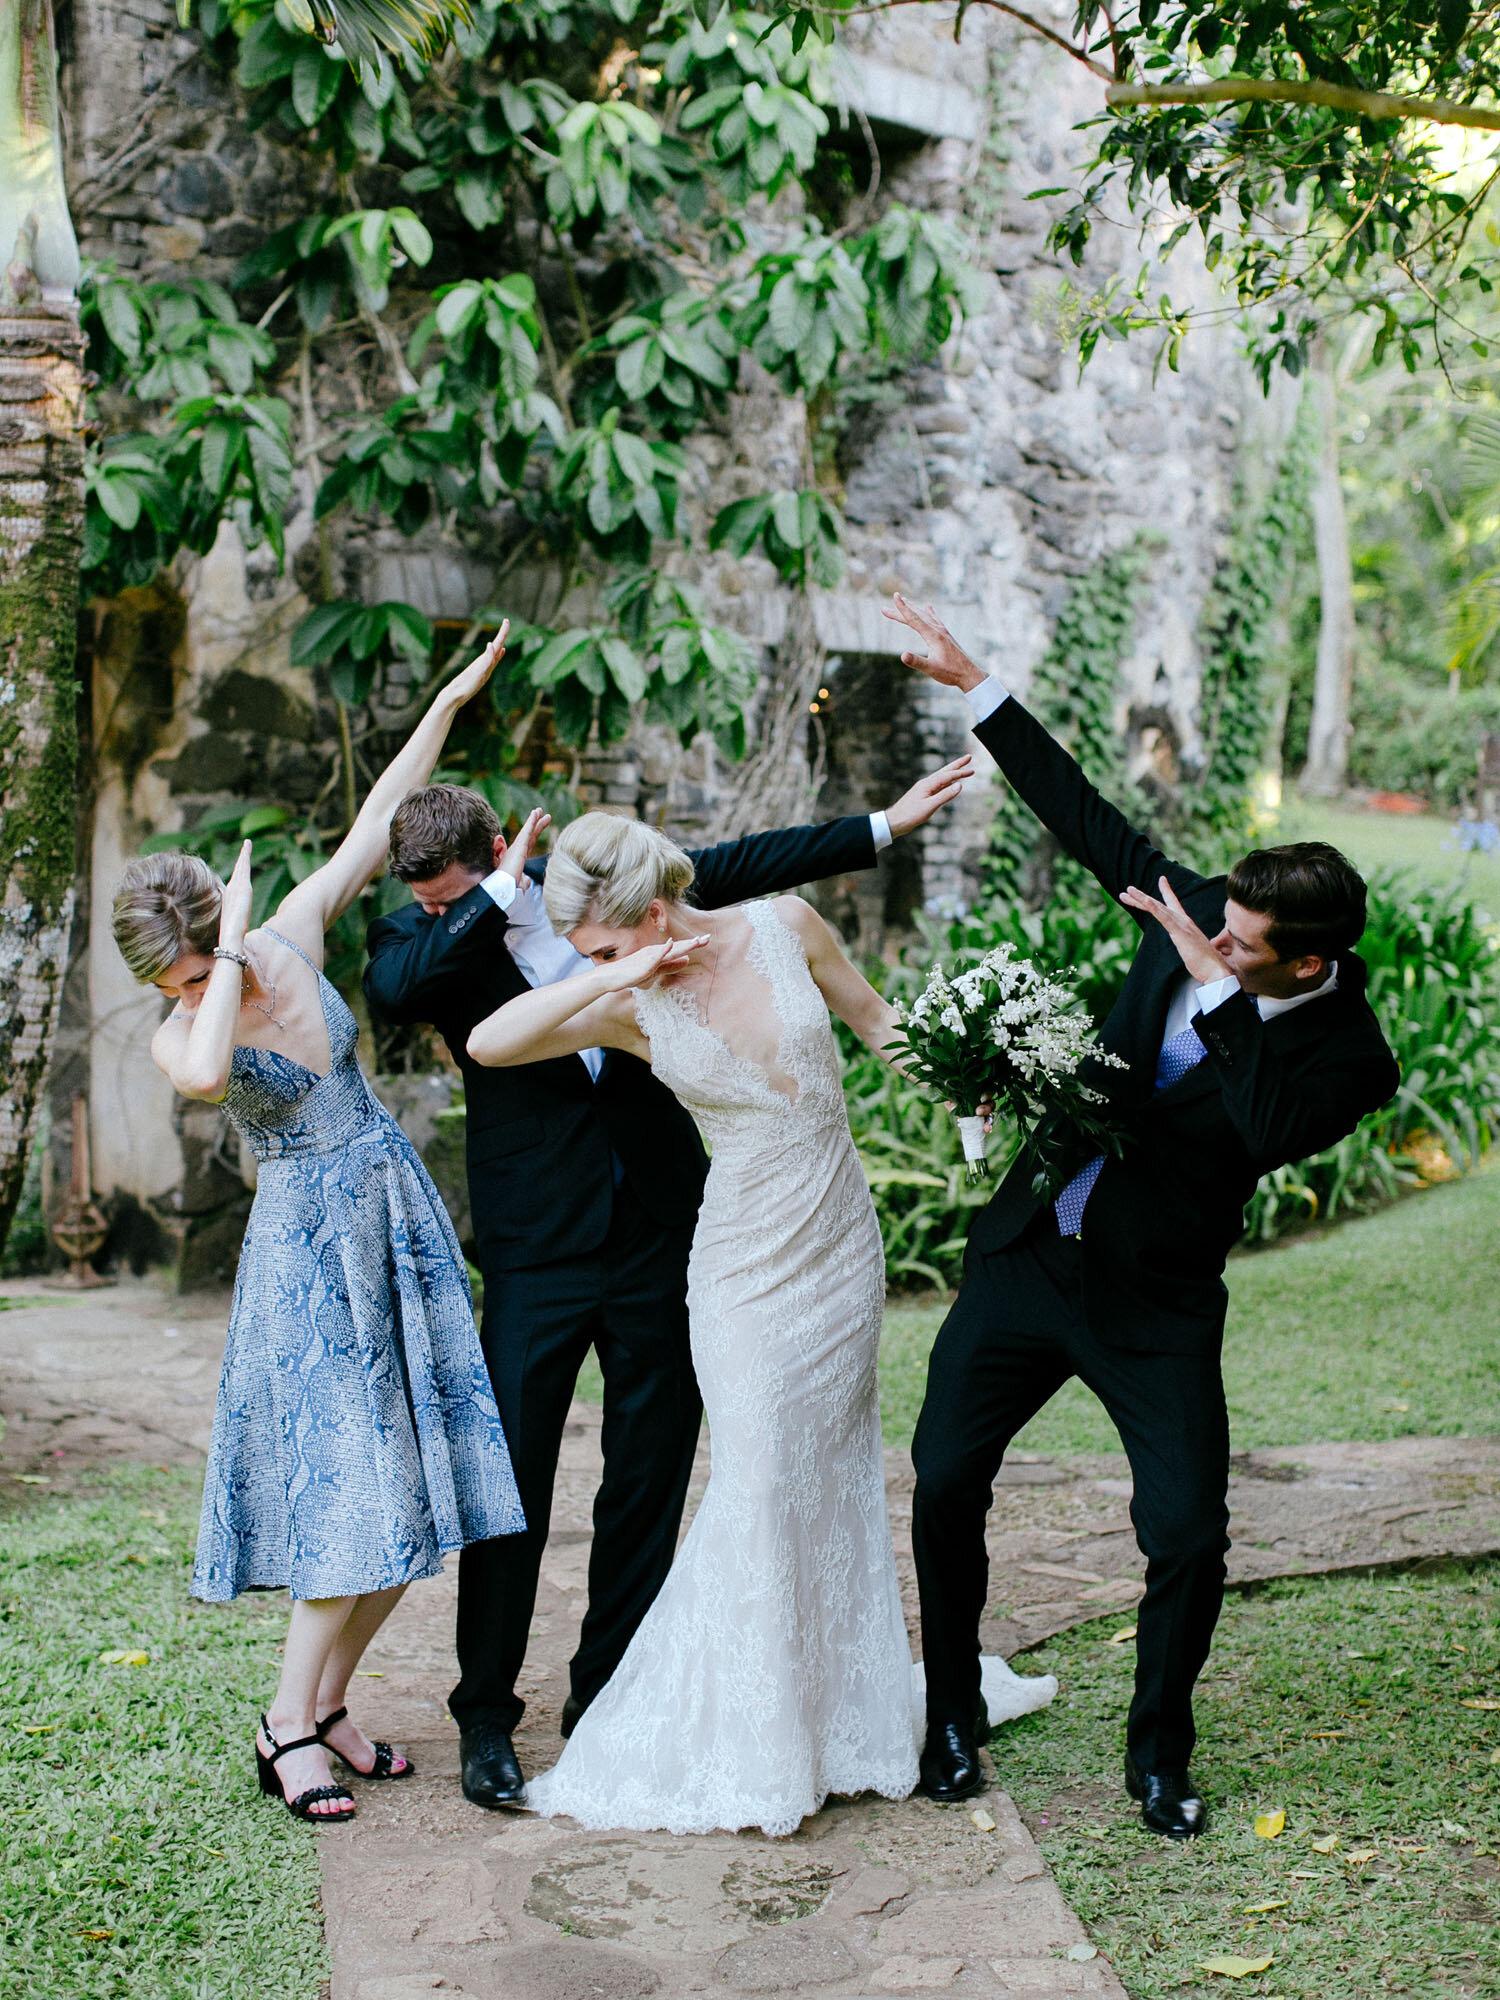 Chris-J-Evans-Maui-Wedding-Kim&Brian3833.jpg